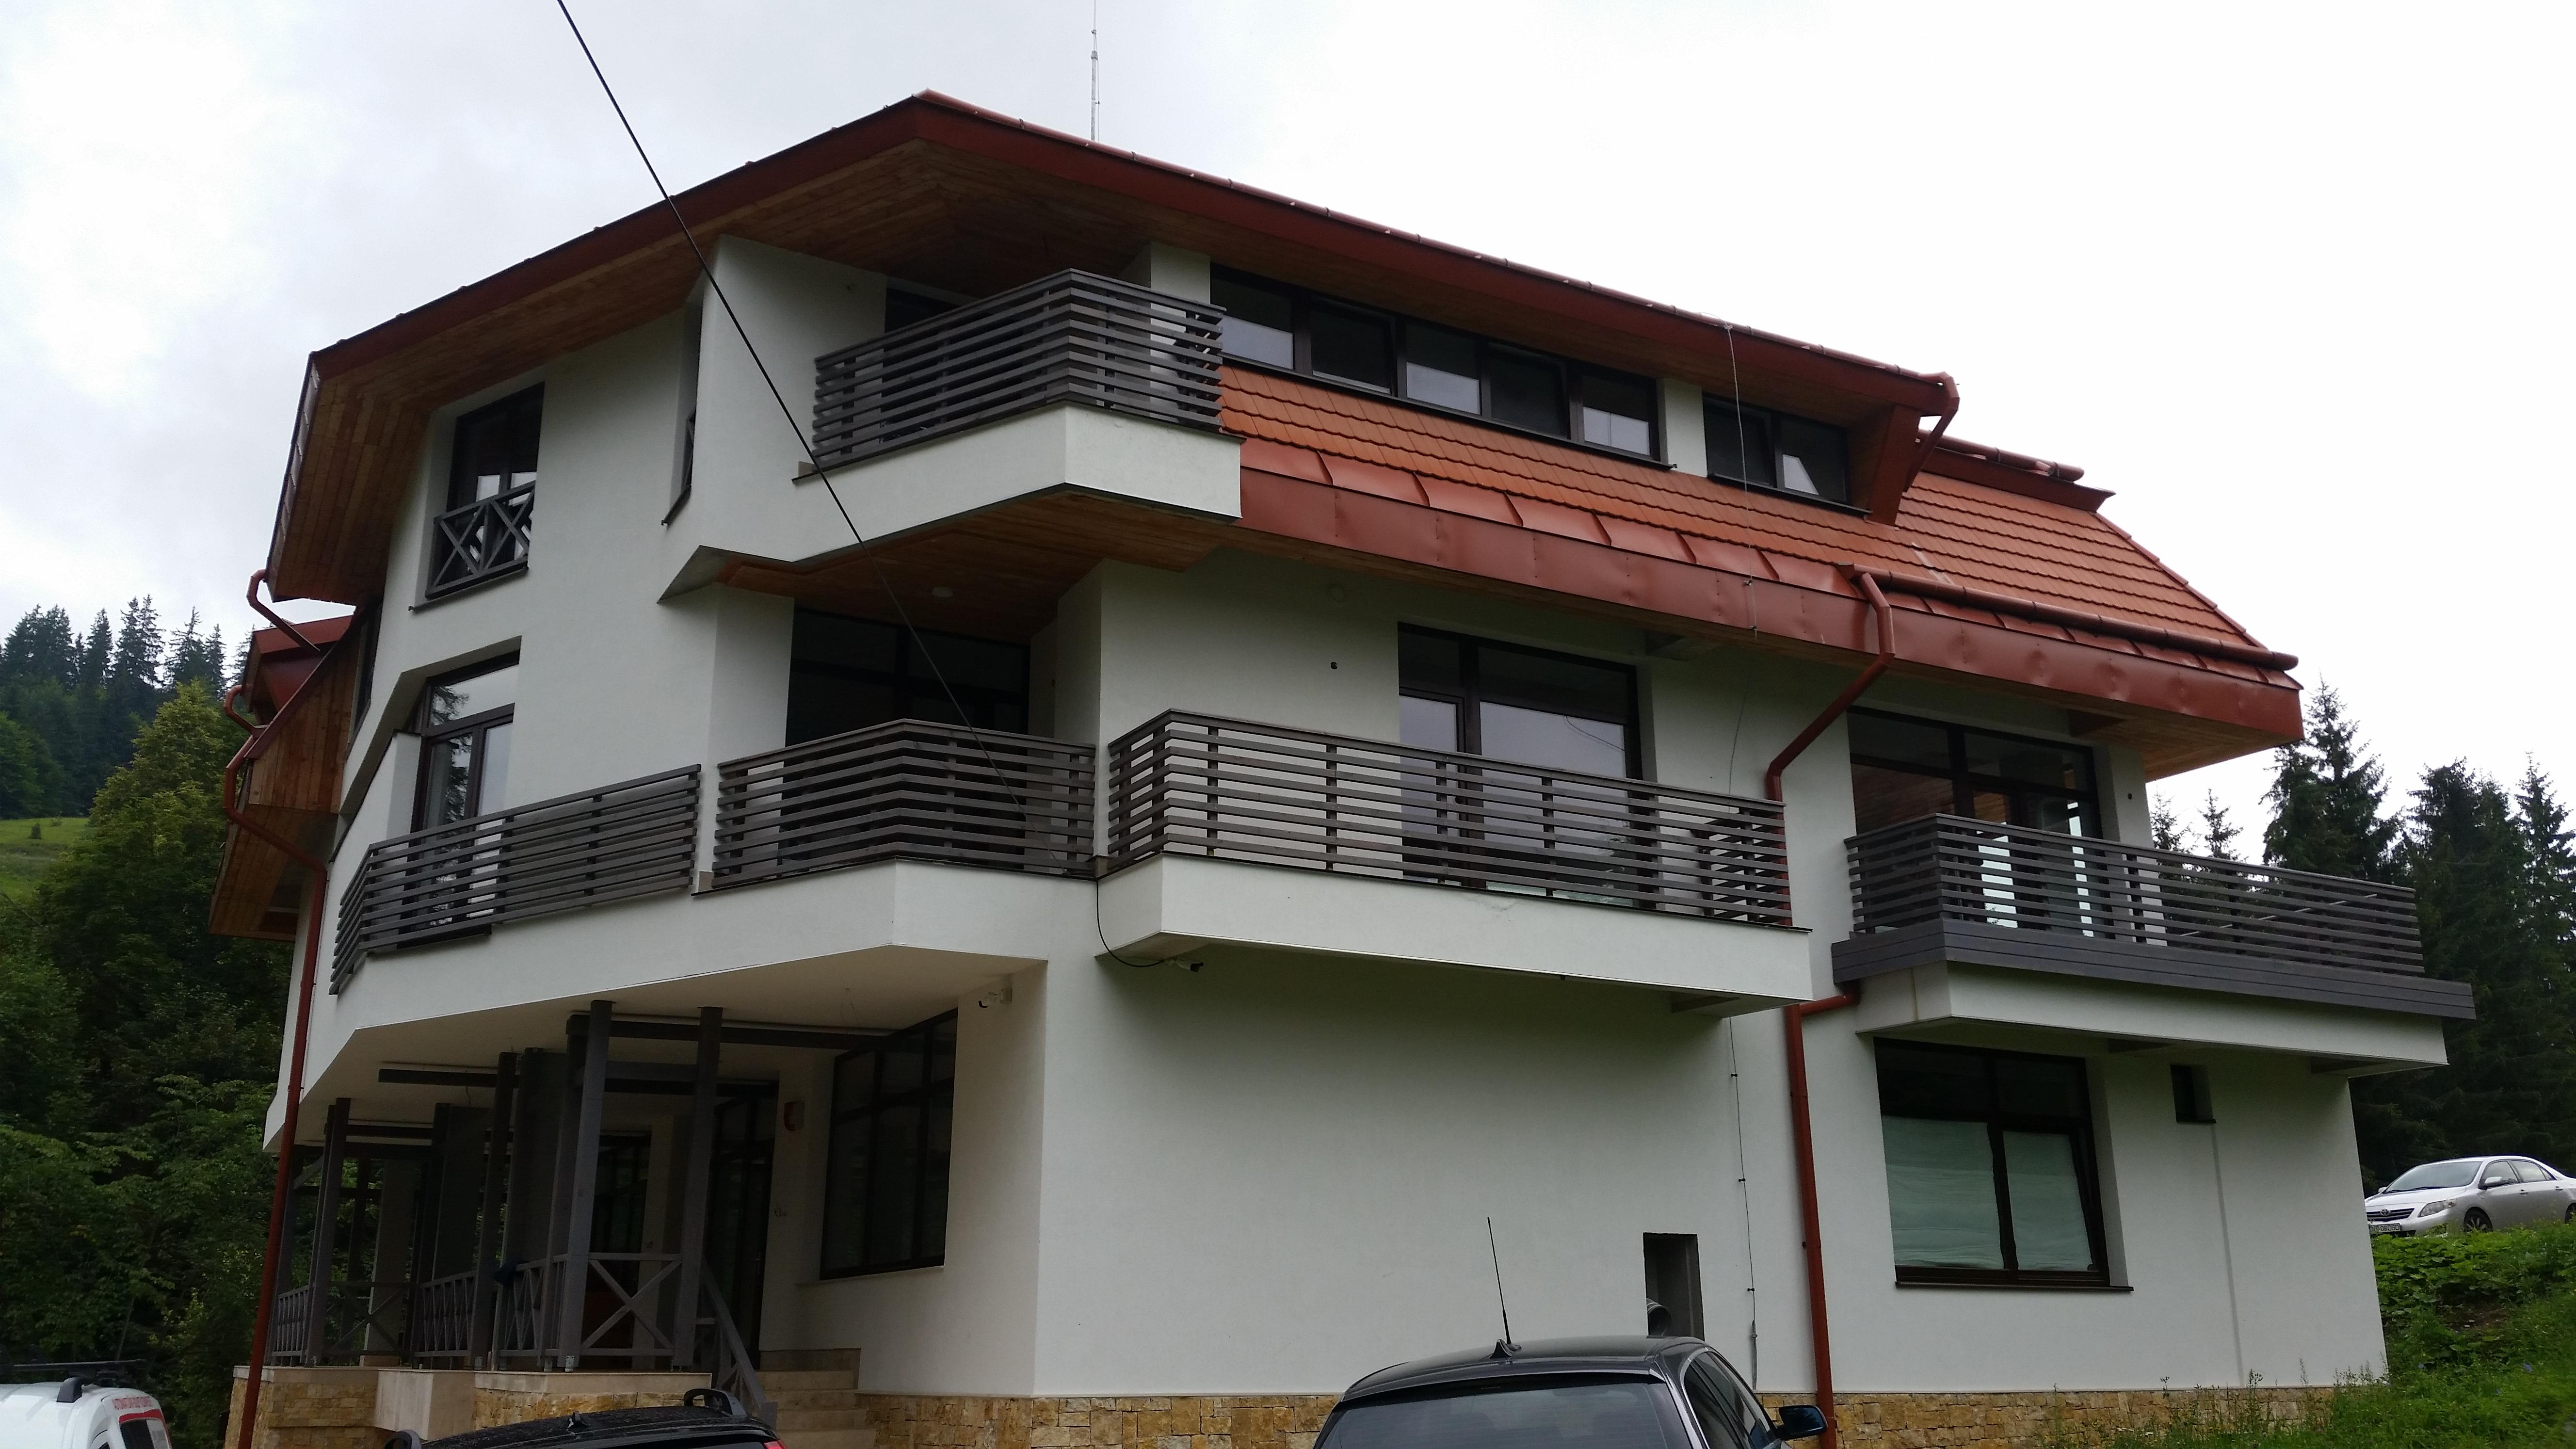 Proiect 14 - Borsec